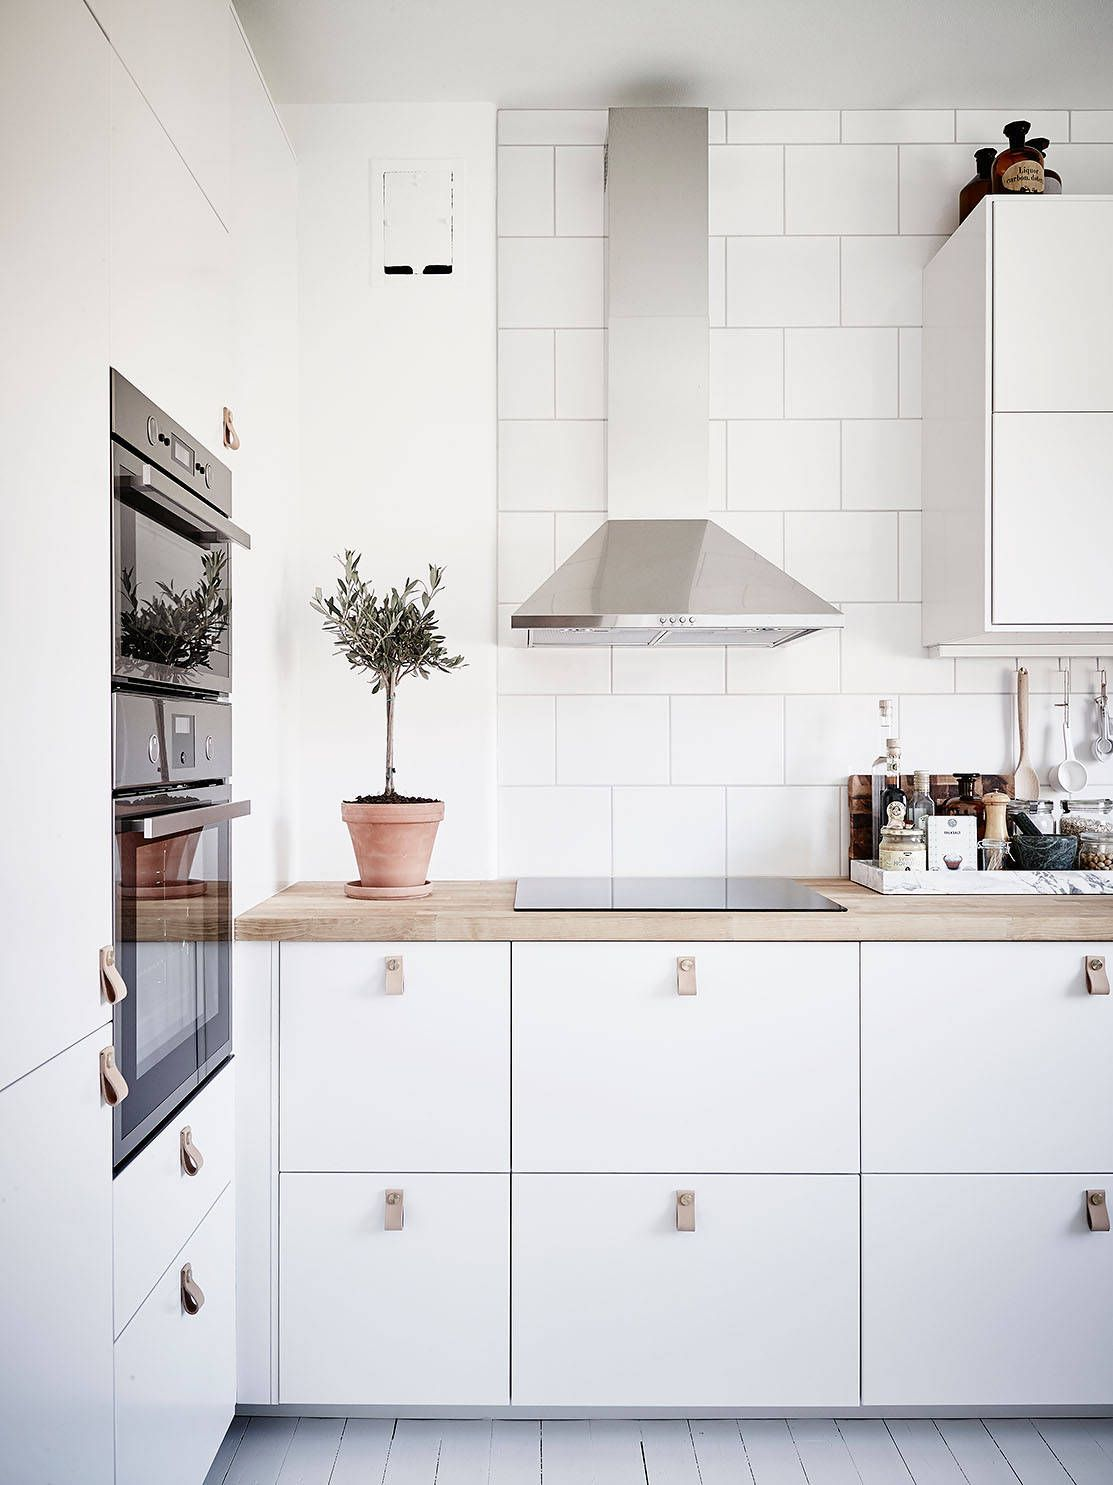 Scandinavian minimalist, white kitchen with wood